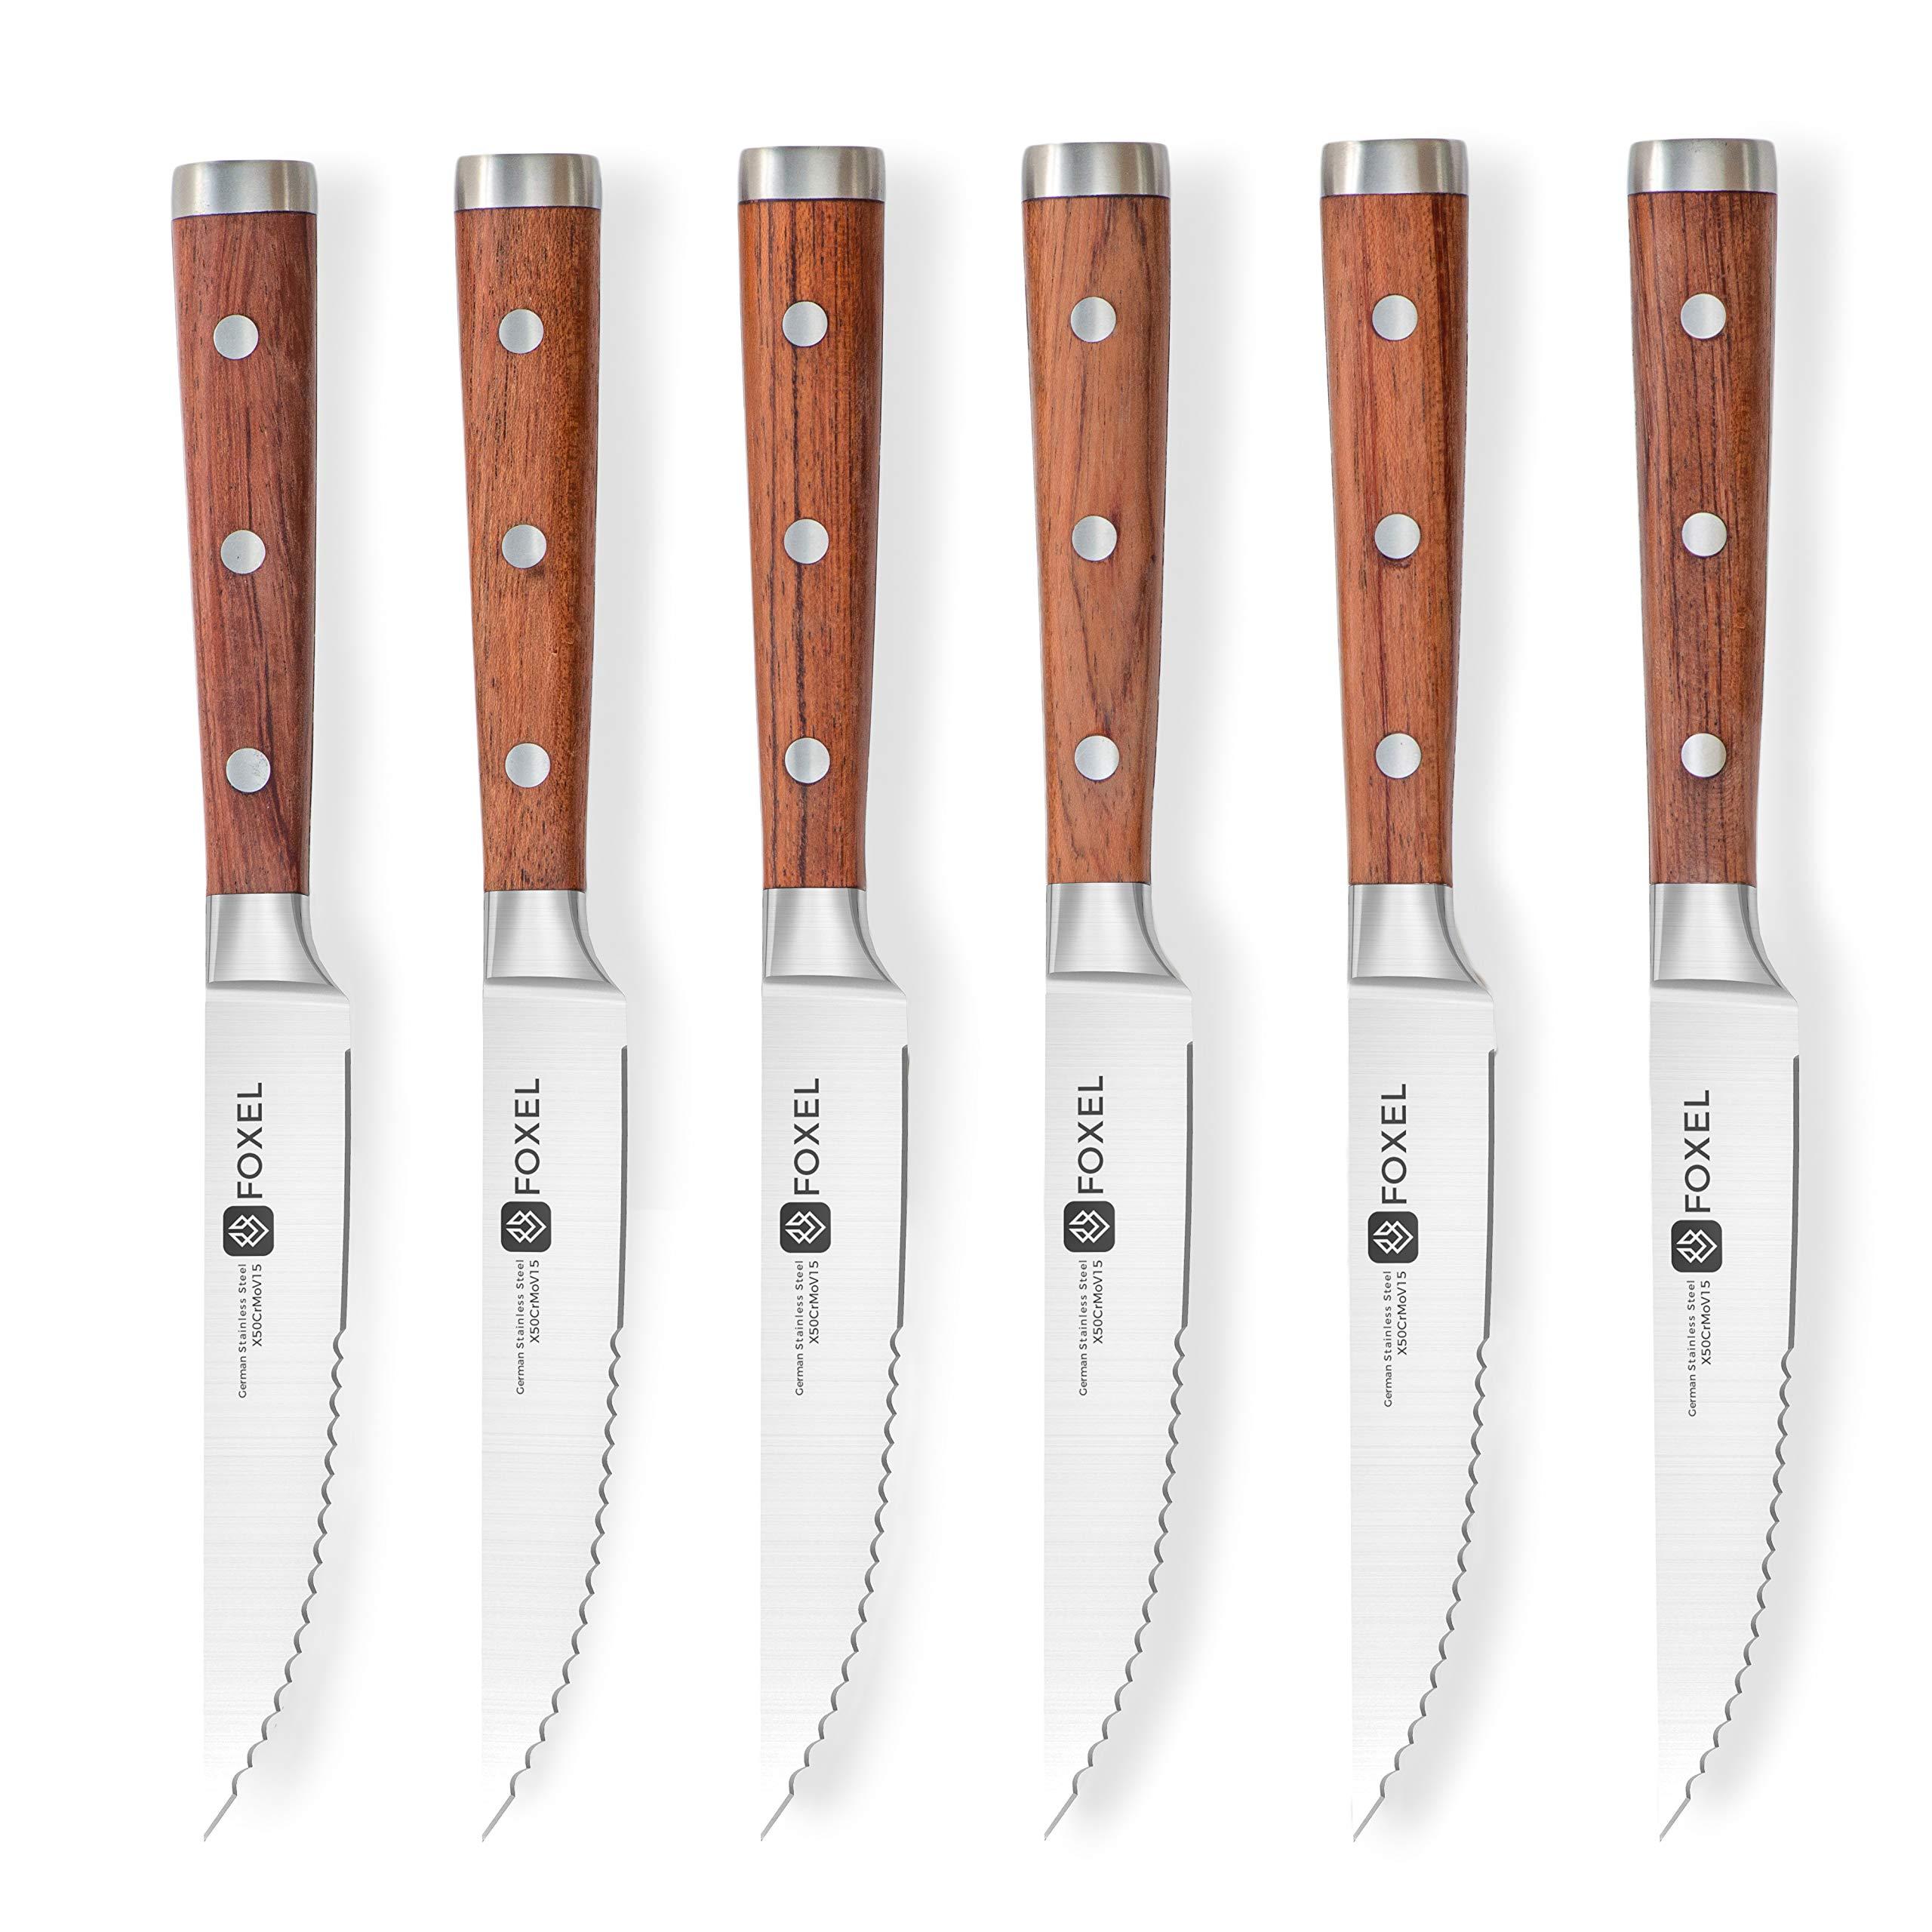 Steak Knives Set of 6 or 12 - Stainless Steel Serrated Steak Knife Set - German Steel Blade Natural Rosewood Full Tang Handle - Steak Knifes Gift Box Set - Not Dishwasher Safe by FOXEL